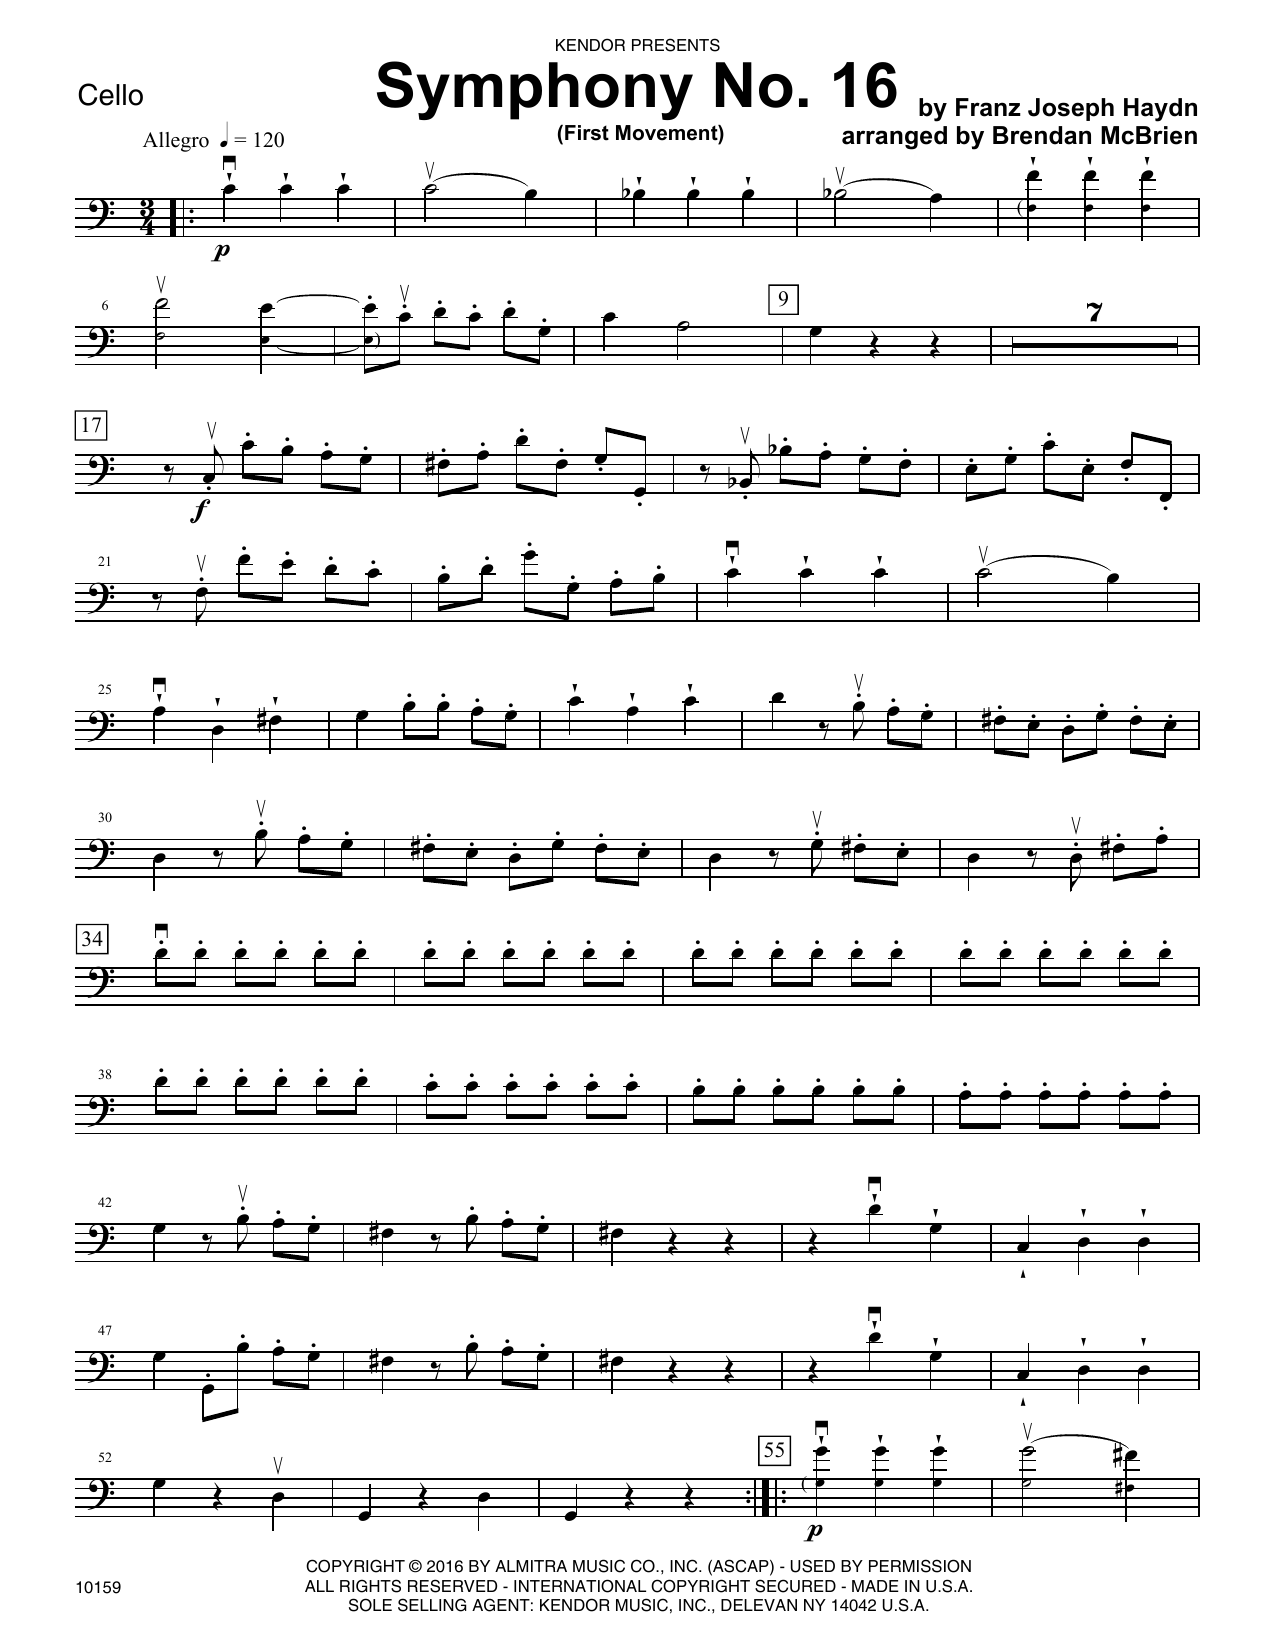 Symphony No. 16 (First Movement) - Cello